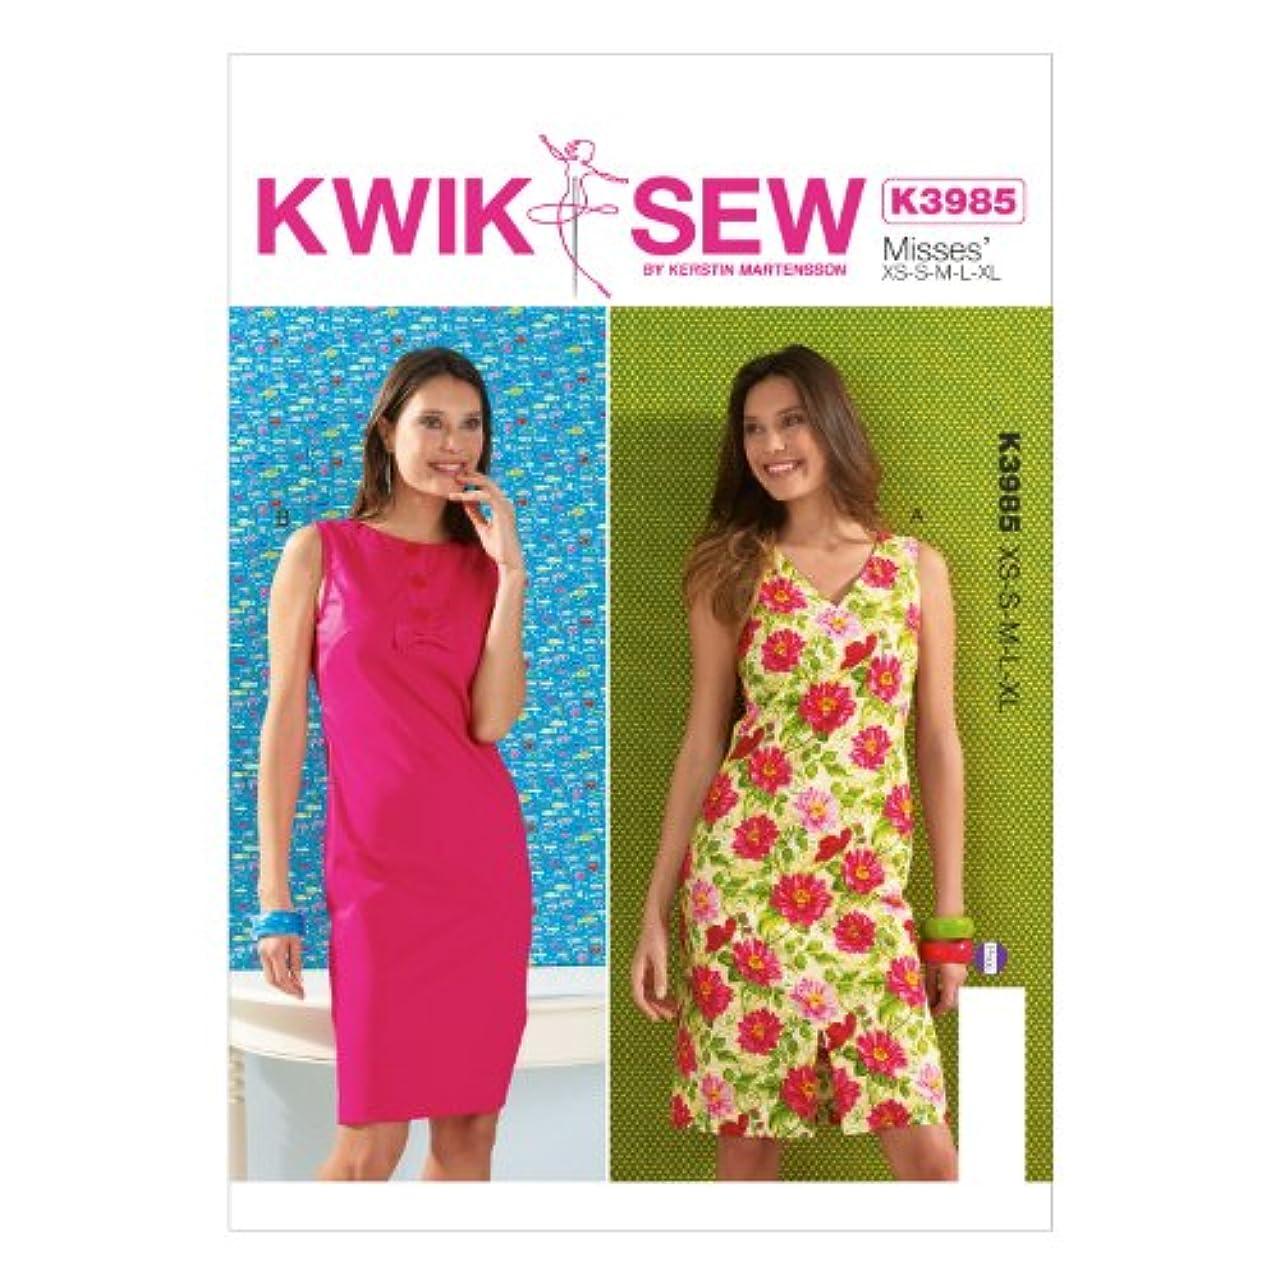 KWIK-SEW PATTERNS K3985OSZ Misses' Dress Sewing Template